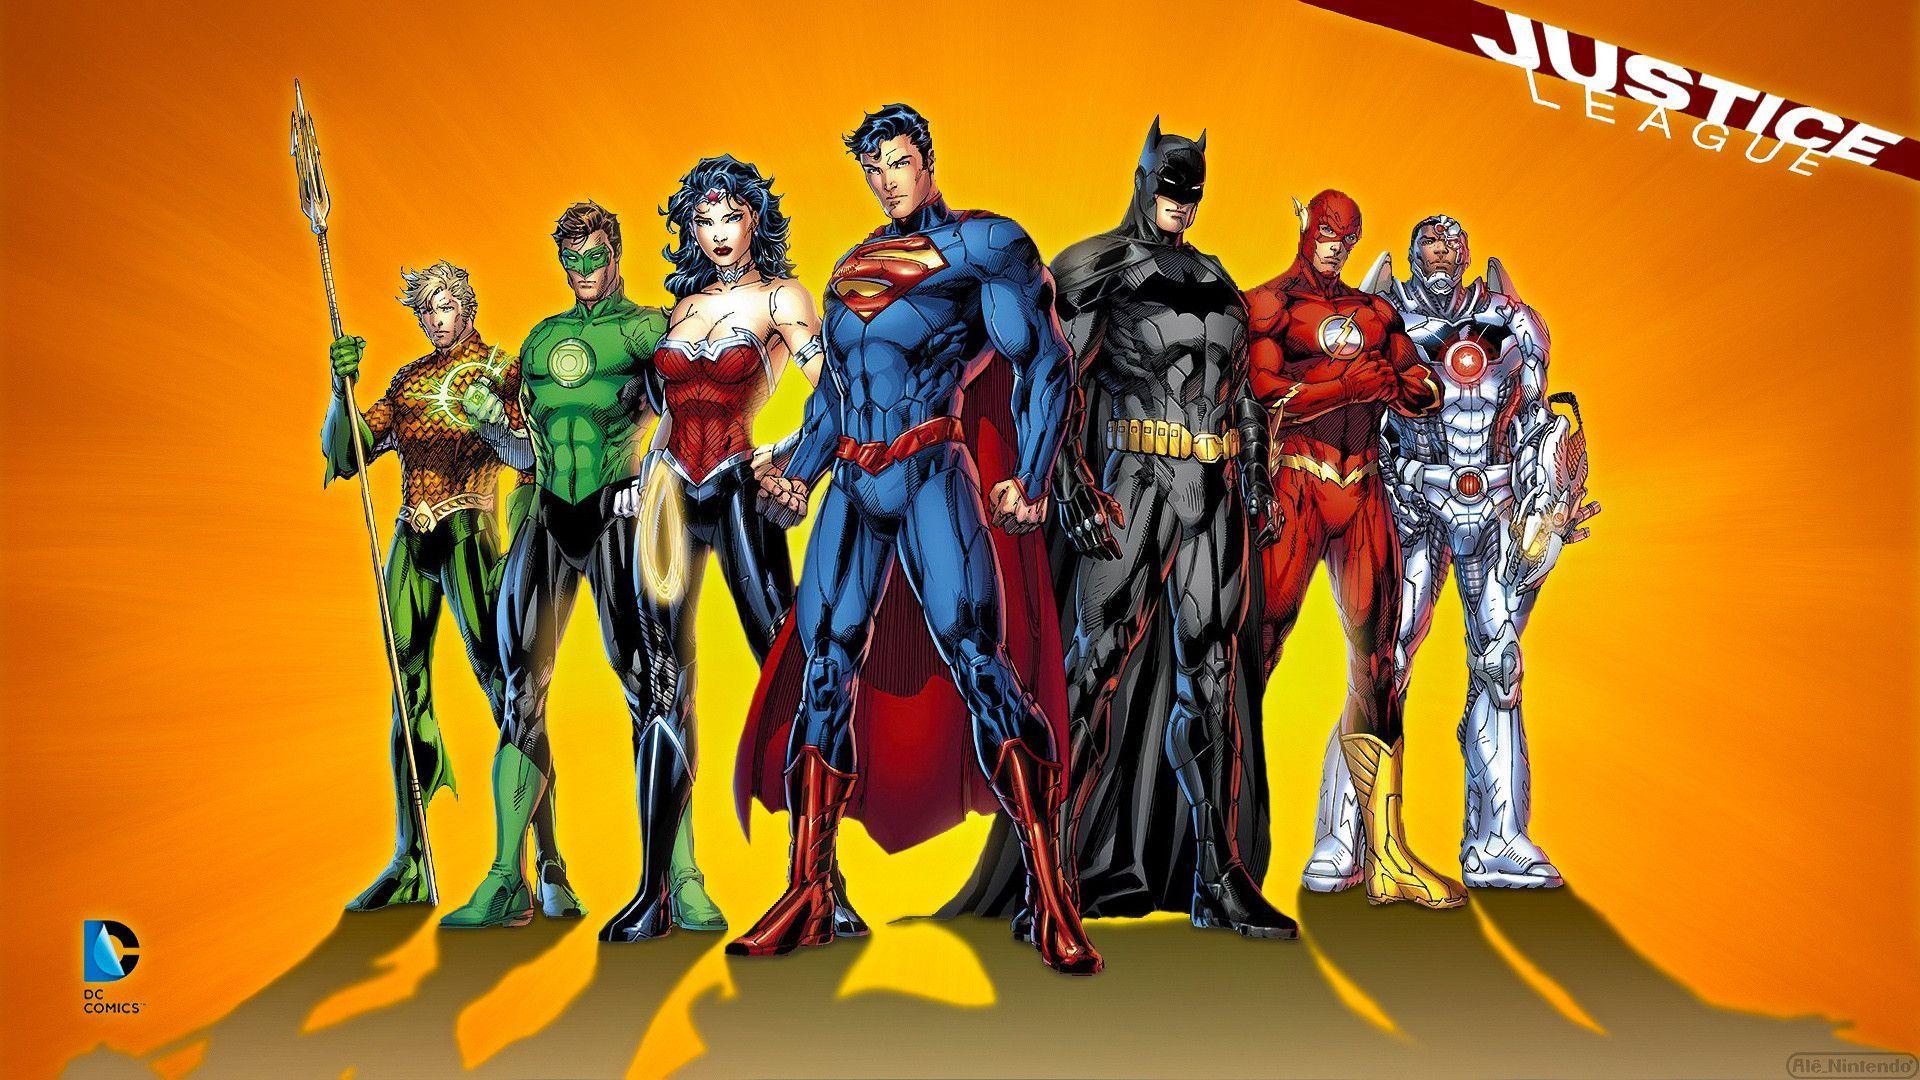 Justice League Wallpapaer